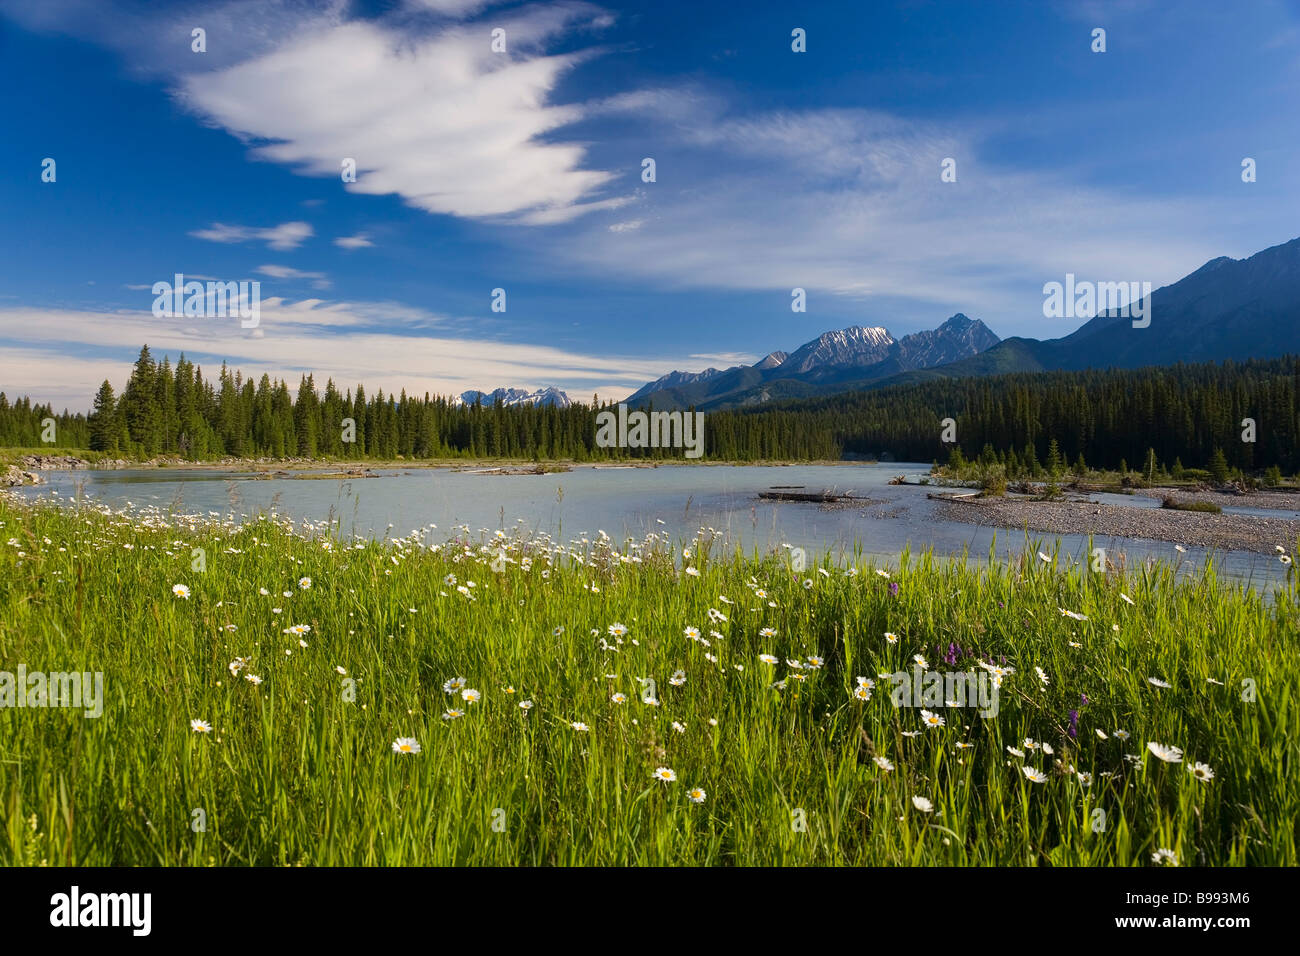 Wild Daisy's, Bellis Perennis L & The Rockies Kootenay National Park, British Colombia, Canada - Stock Image